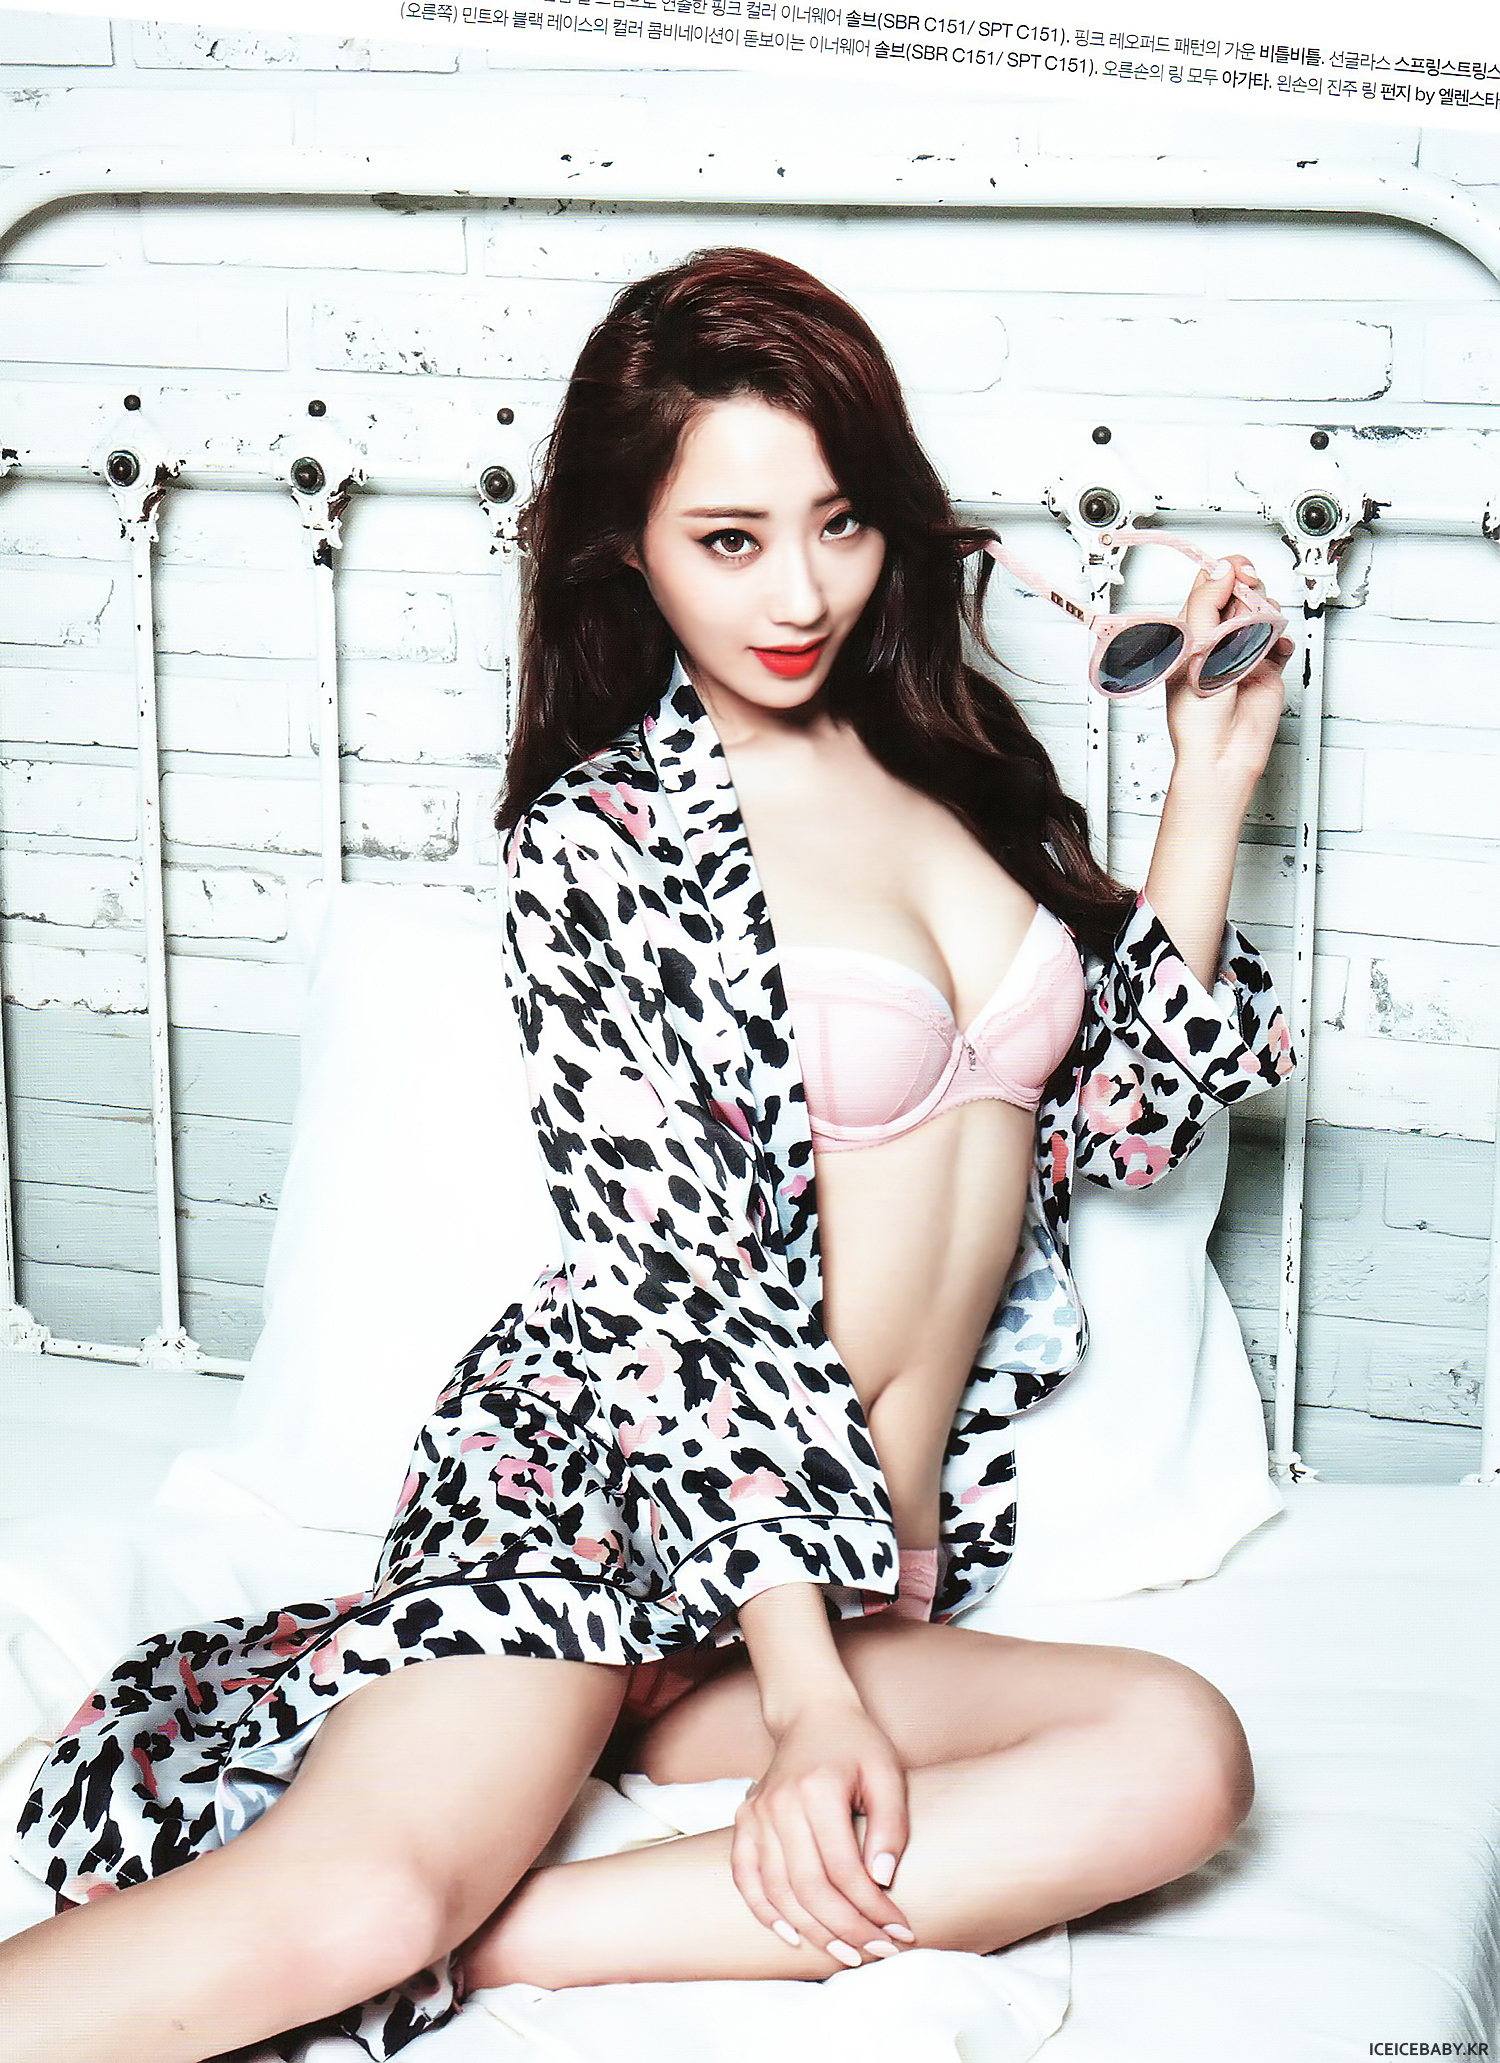 nine muses kyungri models lingerie for the celebrity